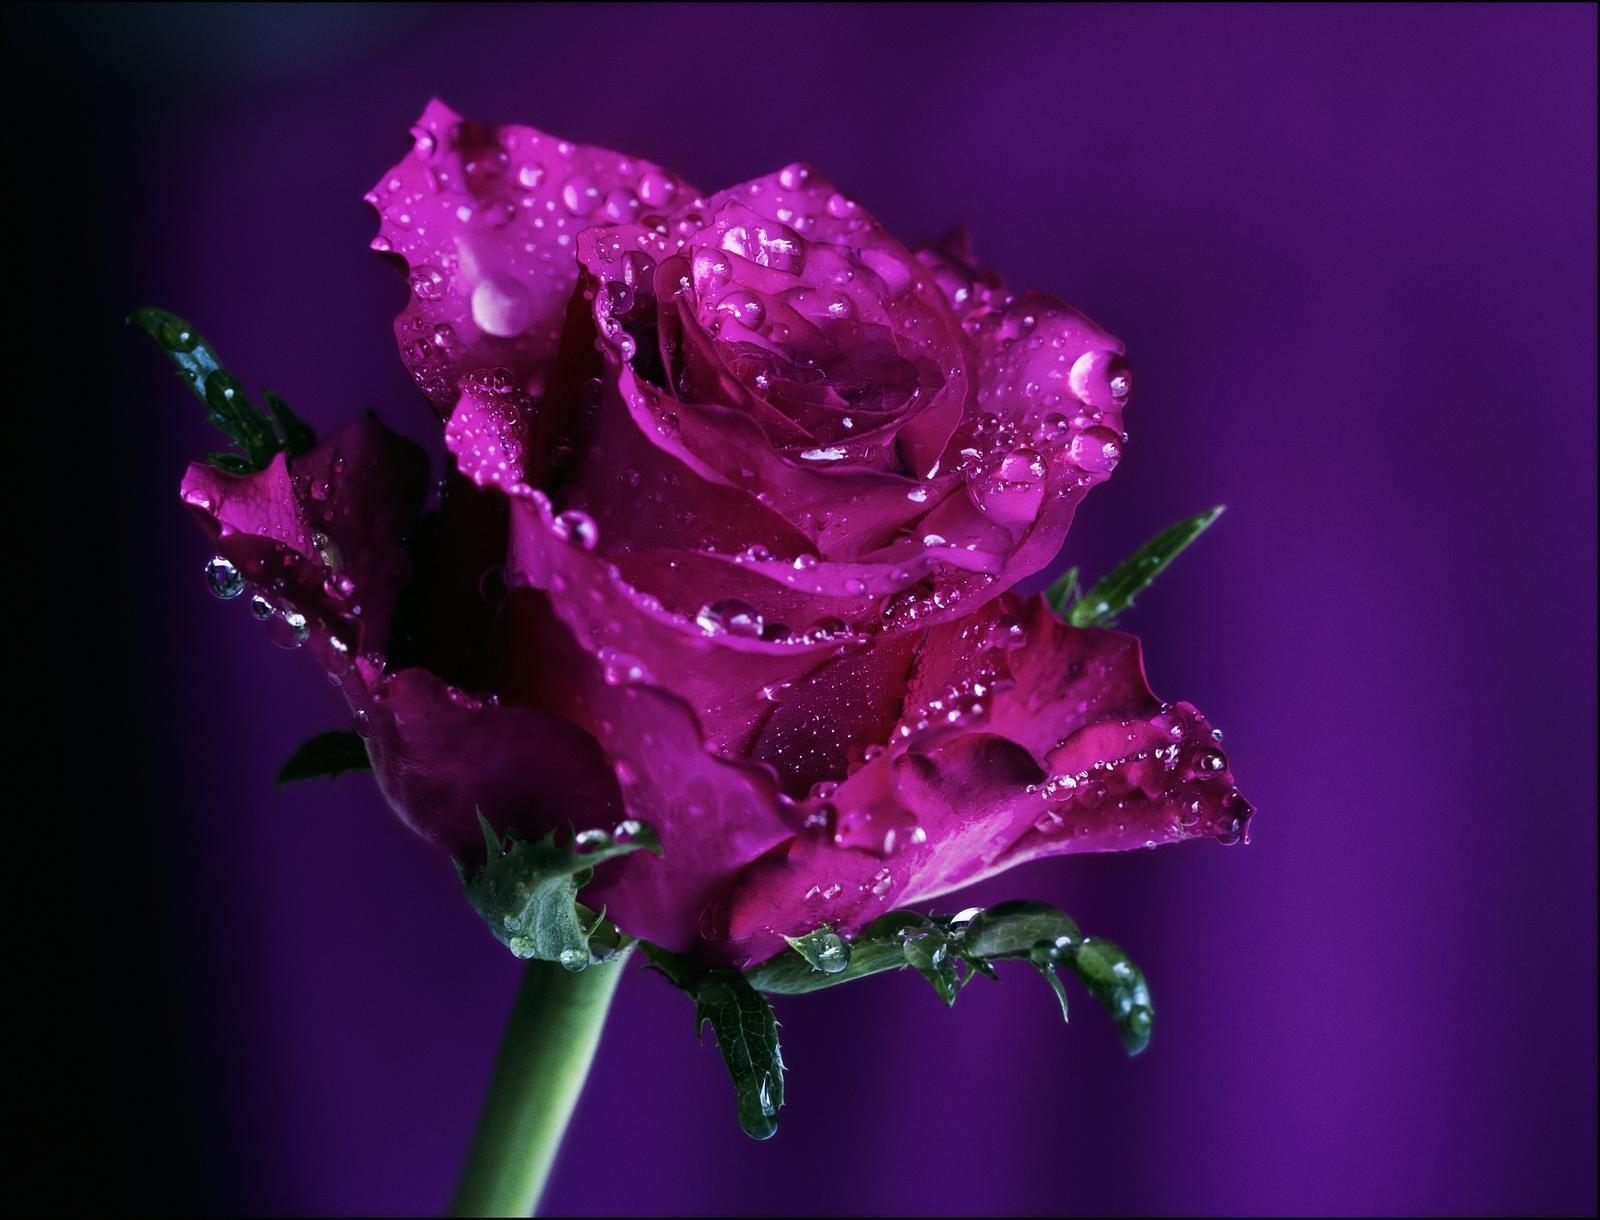 purple rose background wallpaper purple rose hd images